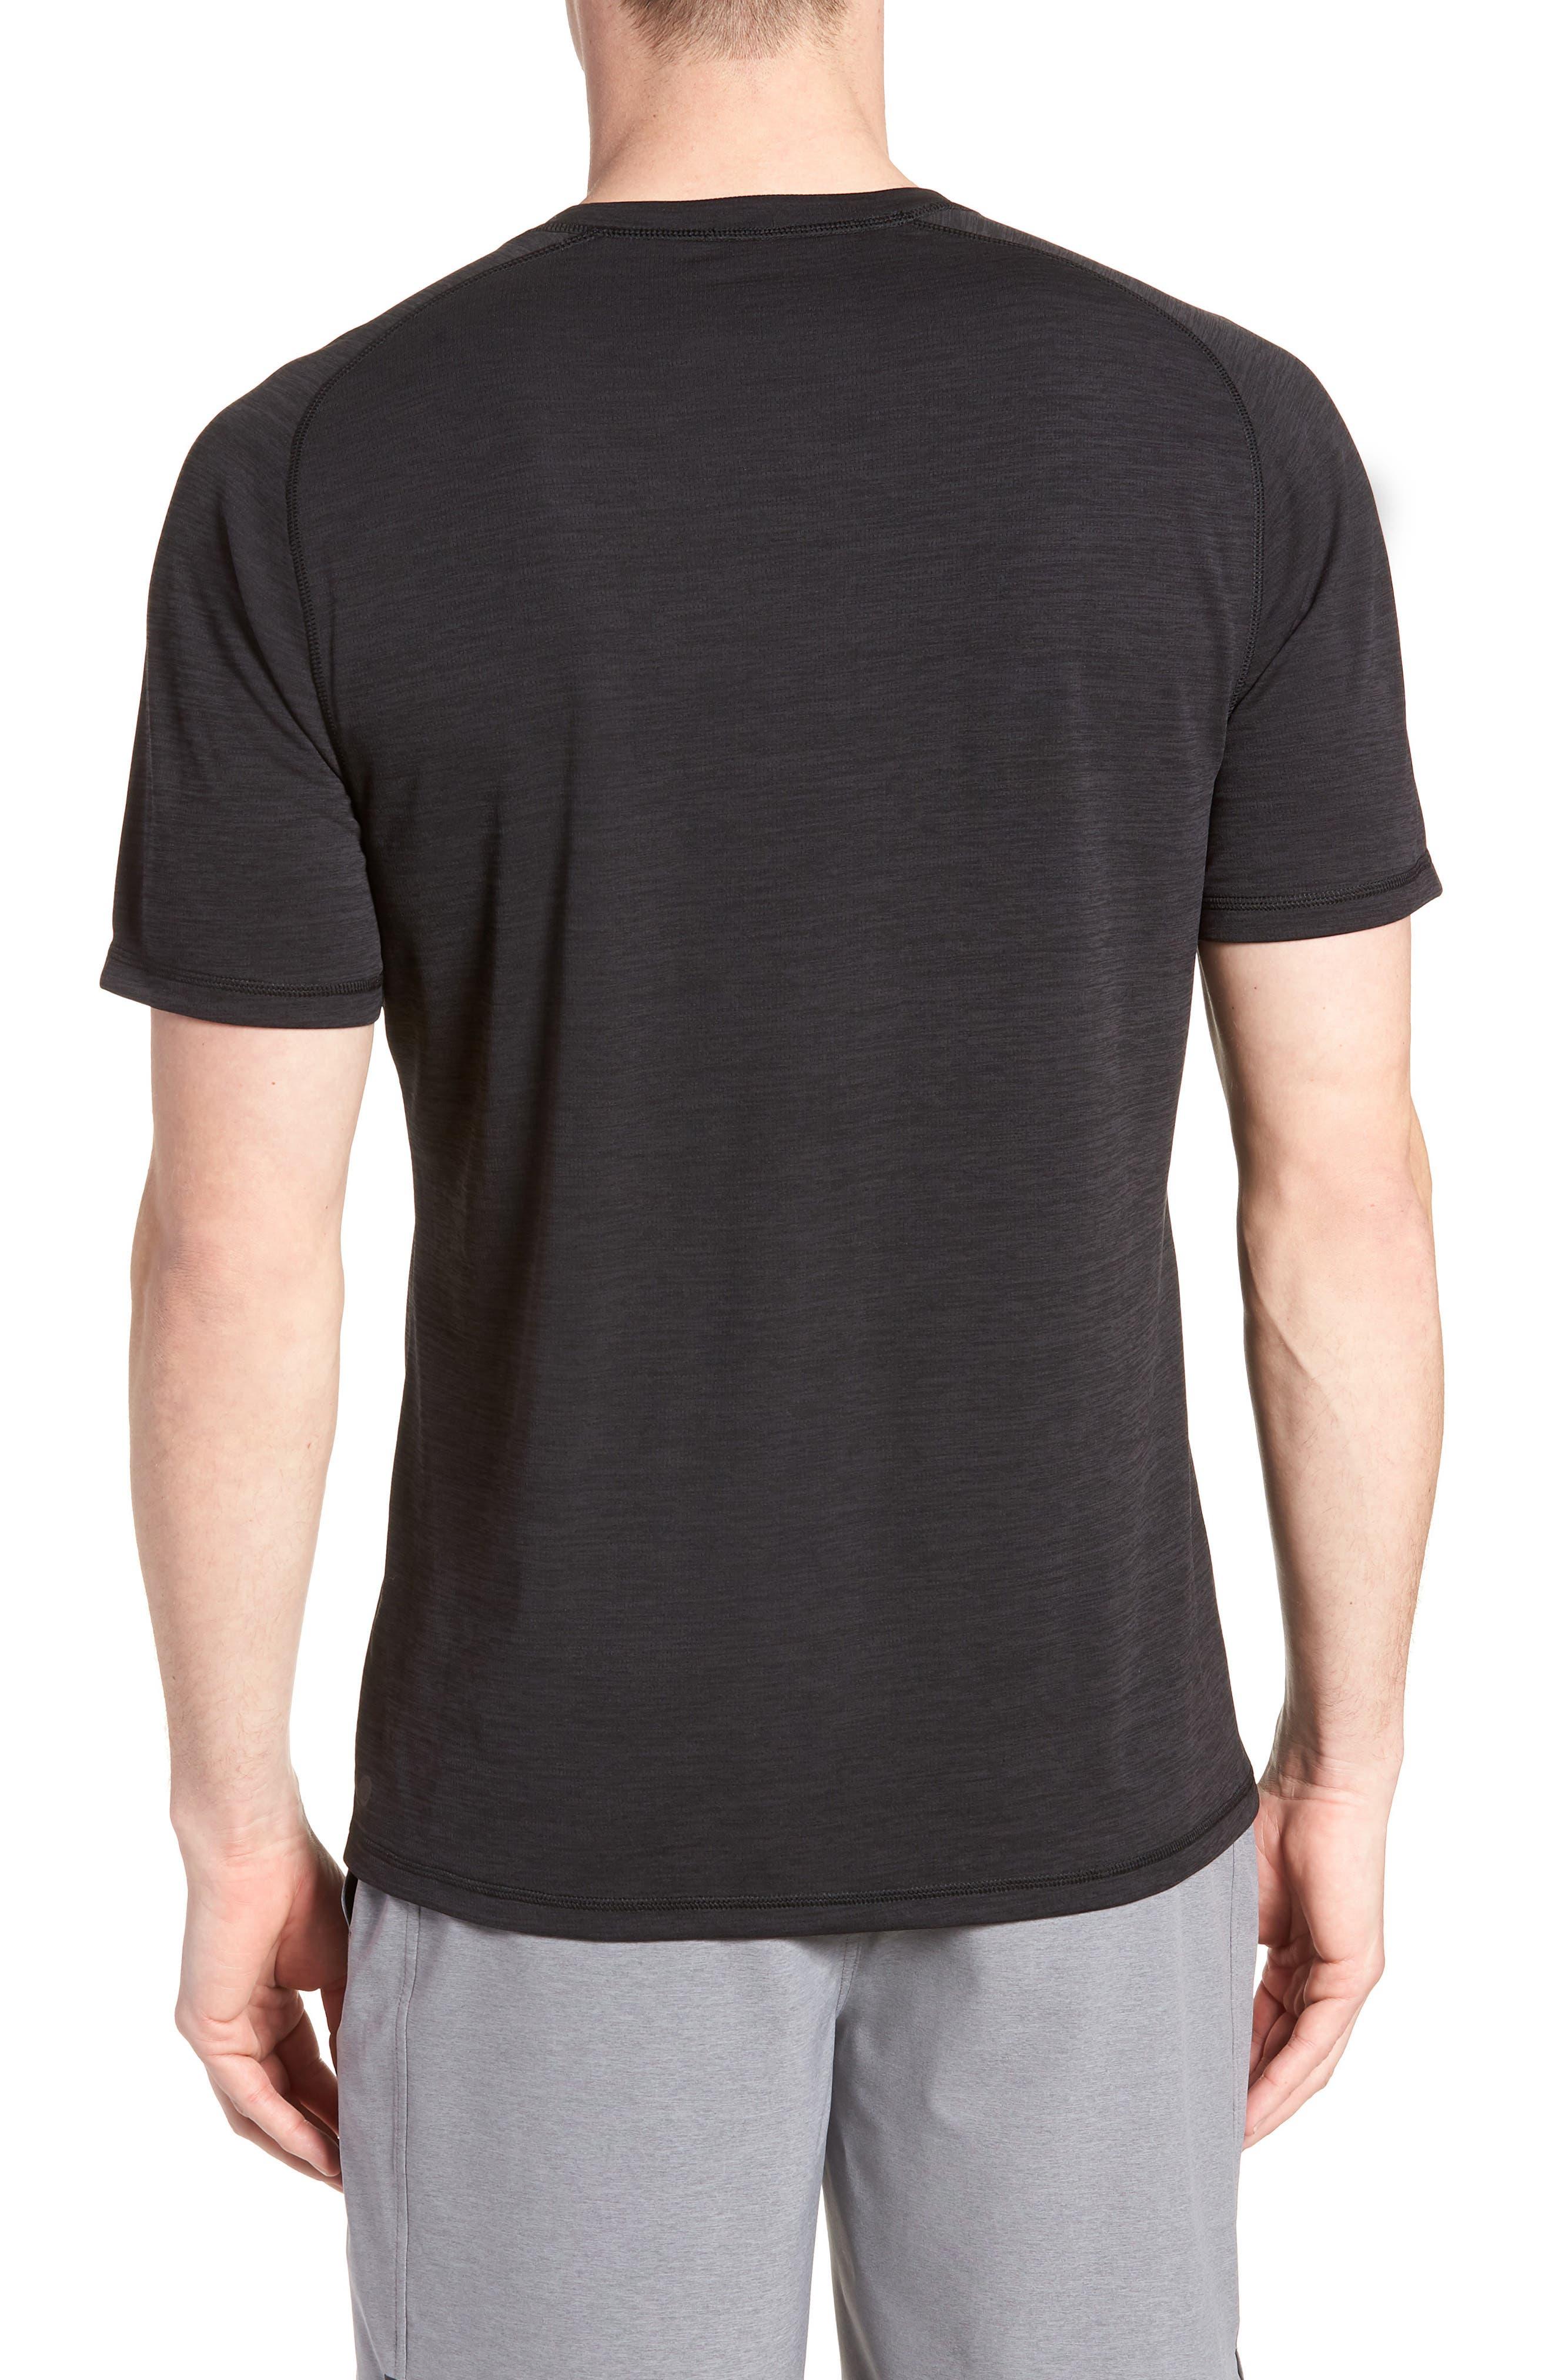 ZELLA, Kinoite Raglan Crewneck T-Shirt, Alternate thumbnail 2, color, BLACK OXIDE MELANGE